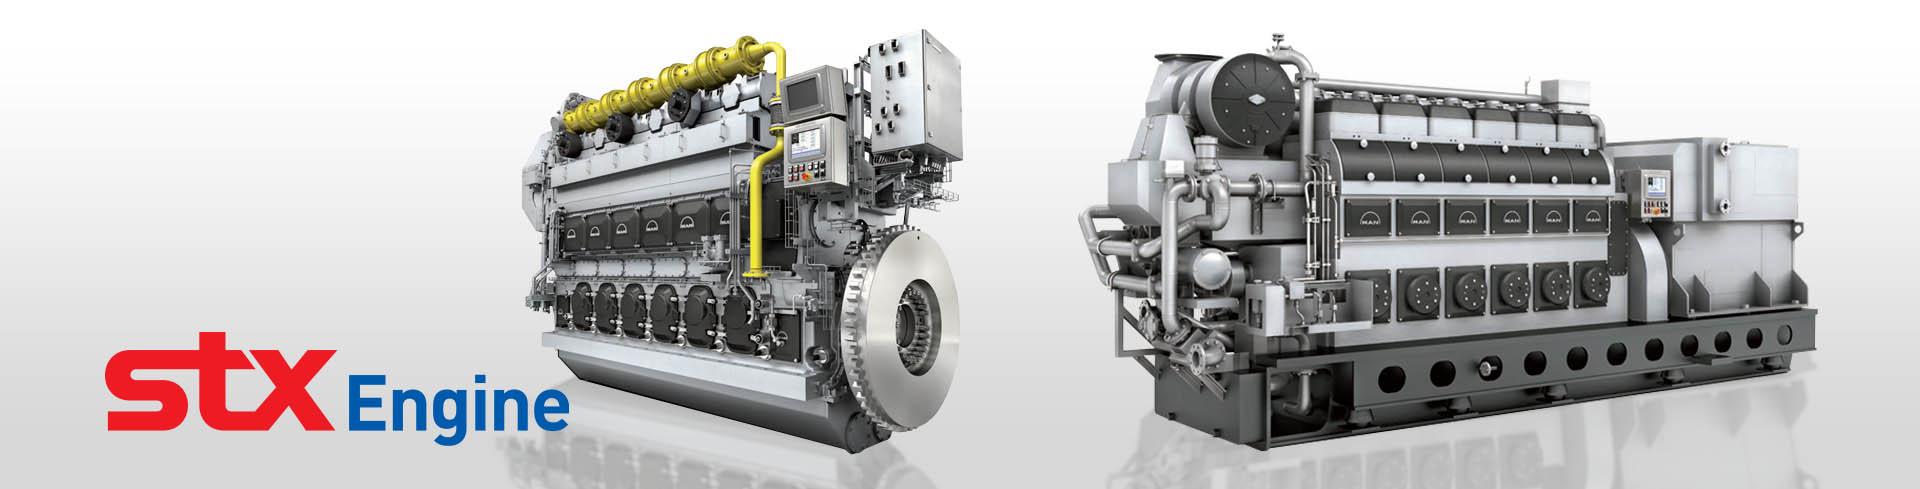 Man Medium Speed Engine